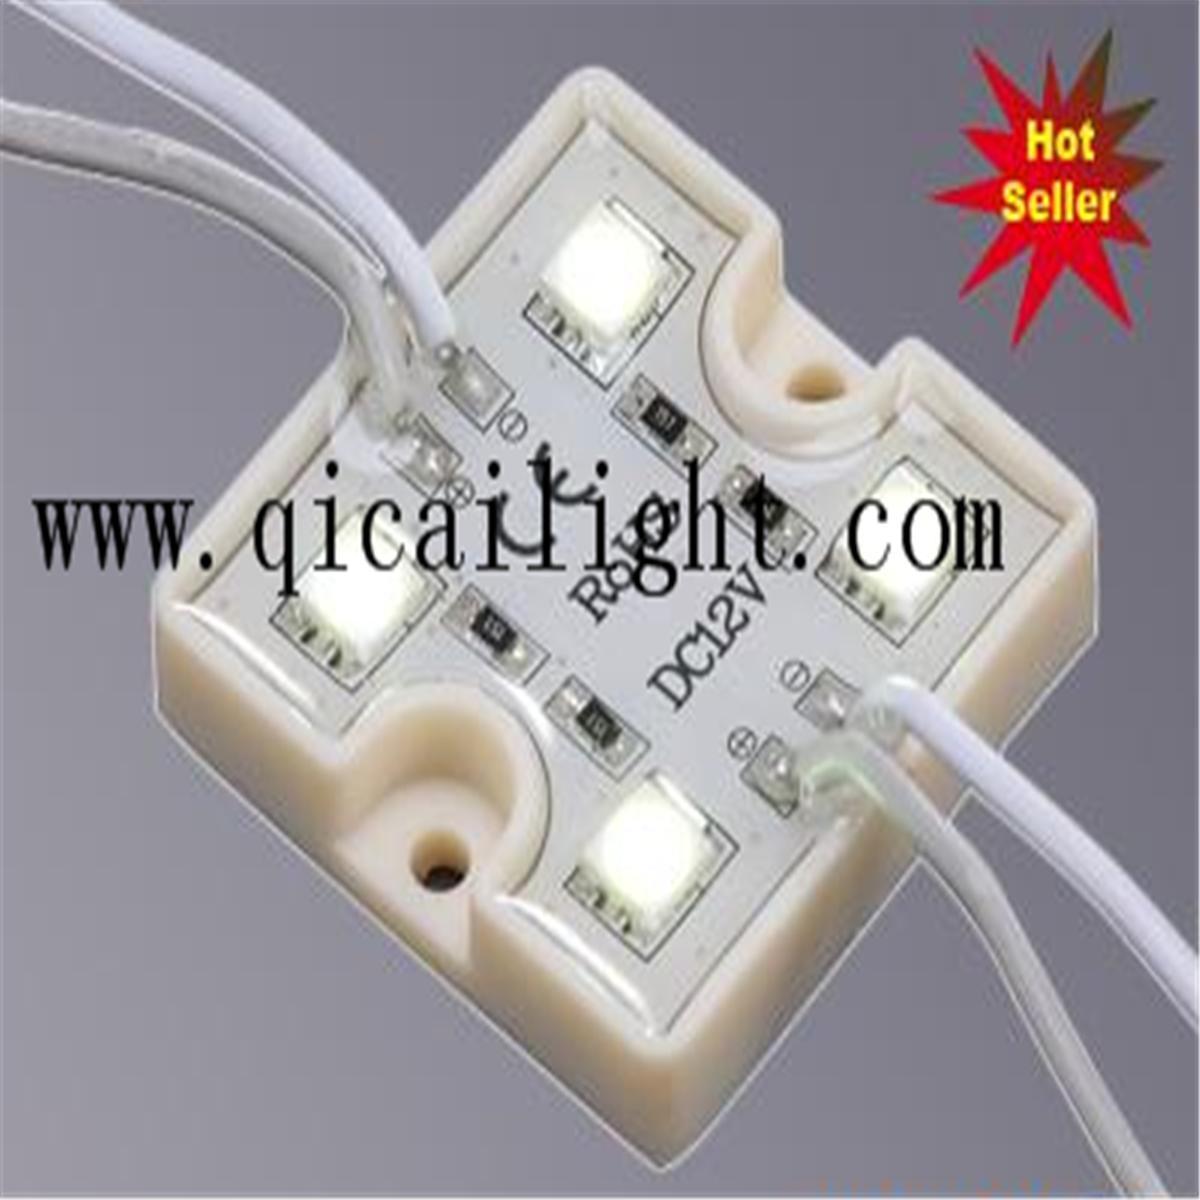 12V Flashing SMD 2835 LED Module Waterproof